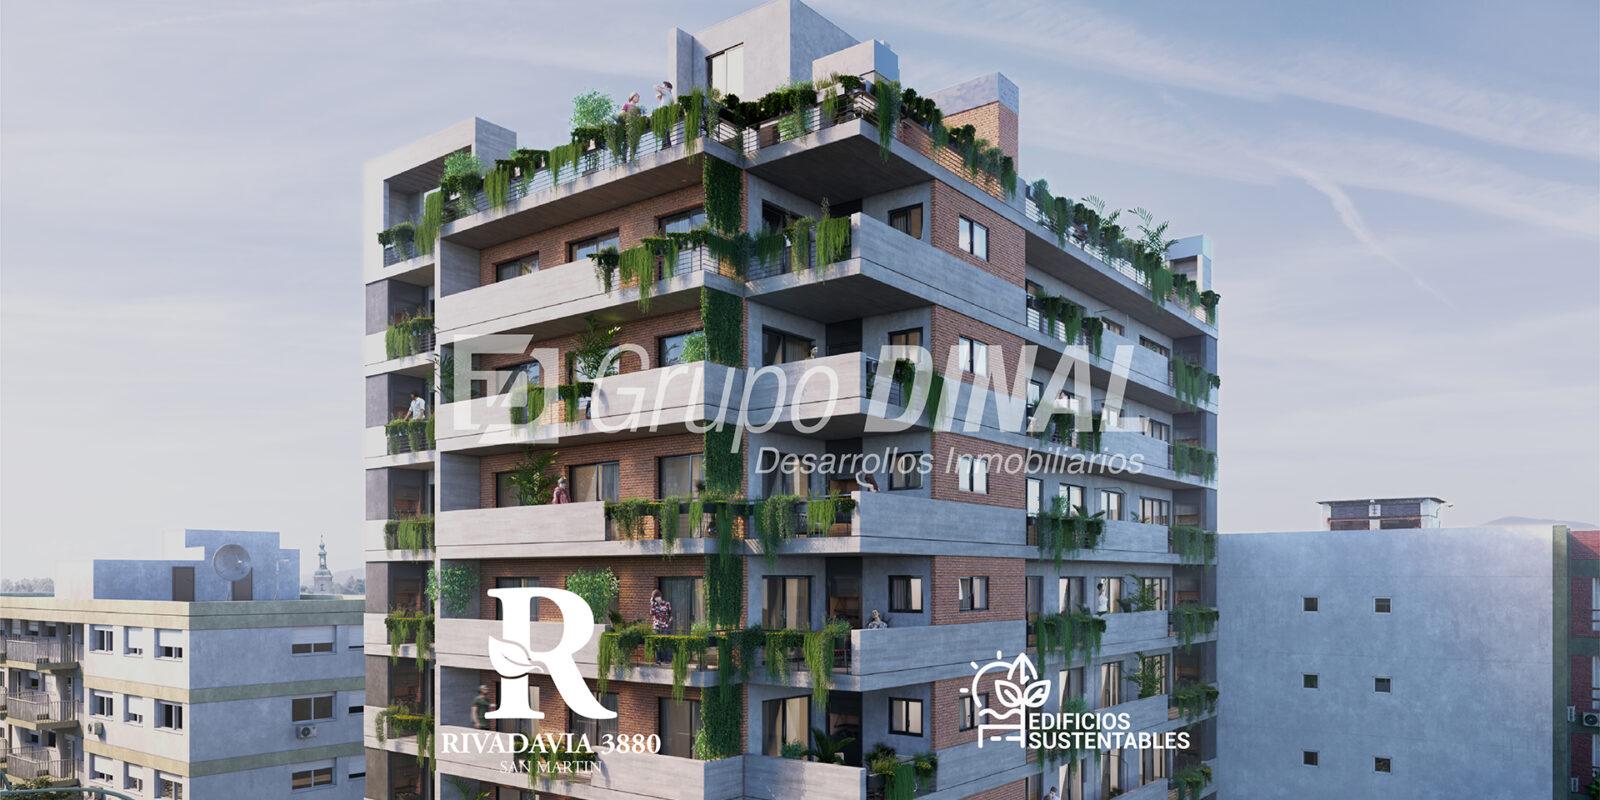 Rivadavia 3880 | San Martín